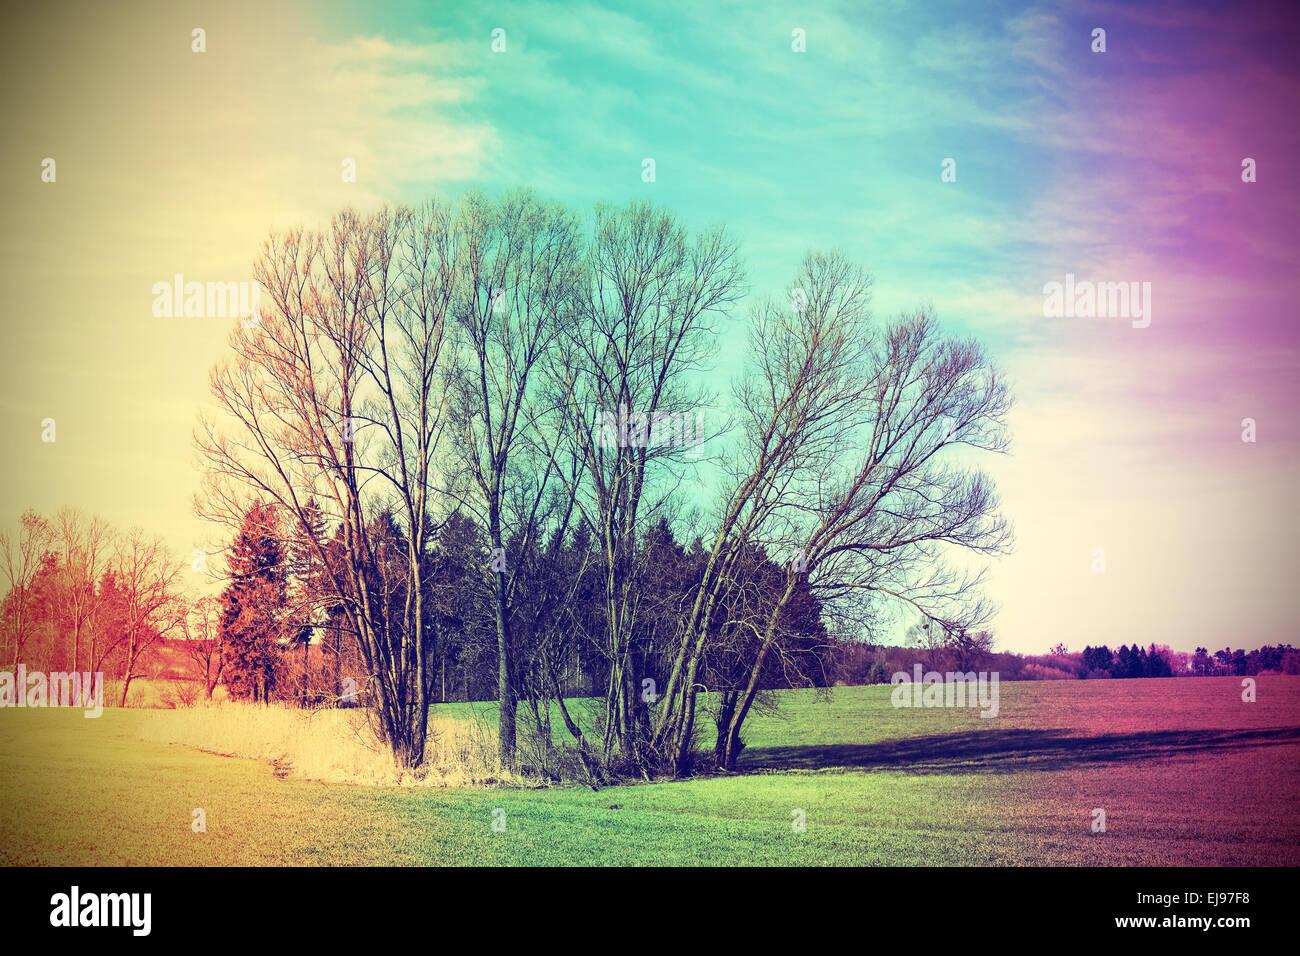 Old film stylized rural landscape. - Stock Image